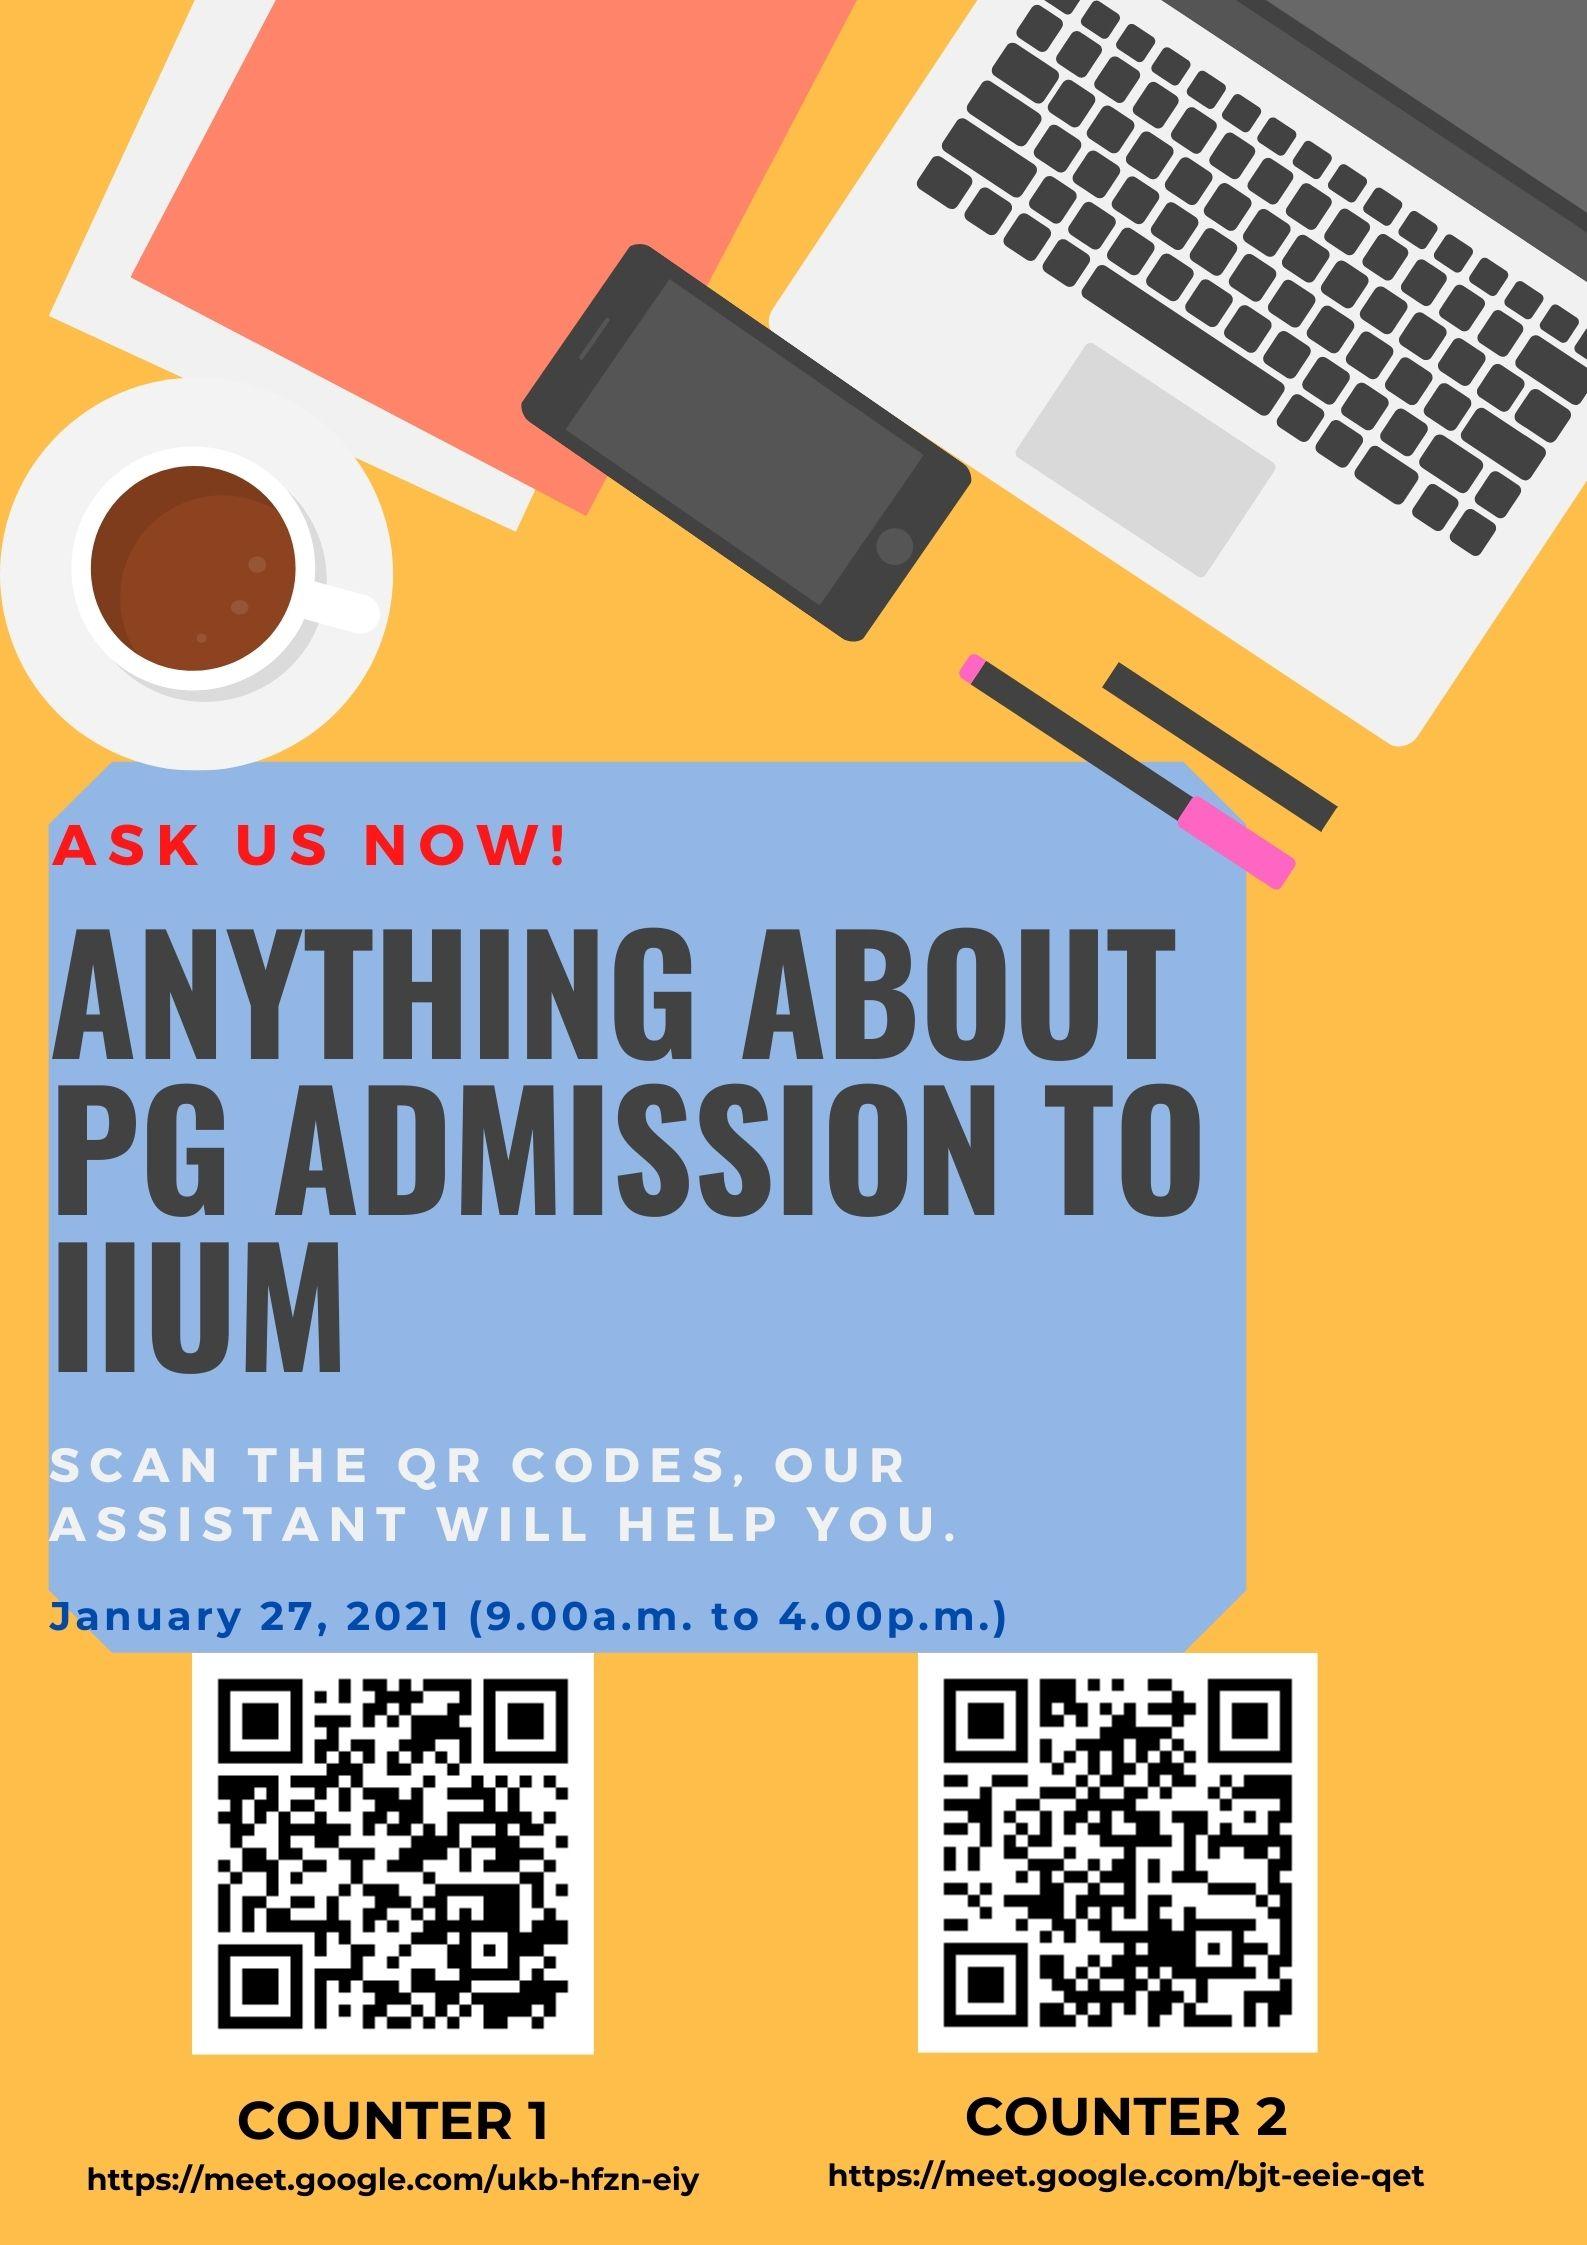 PG Admission Virtual Promotion